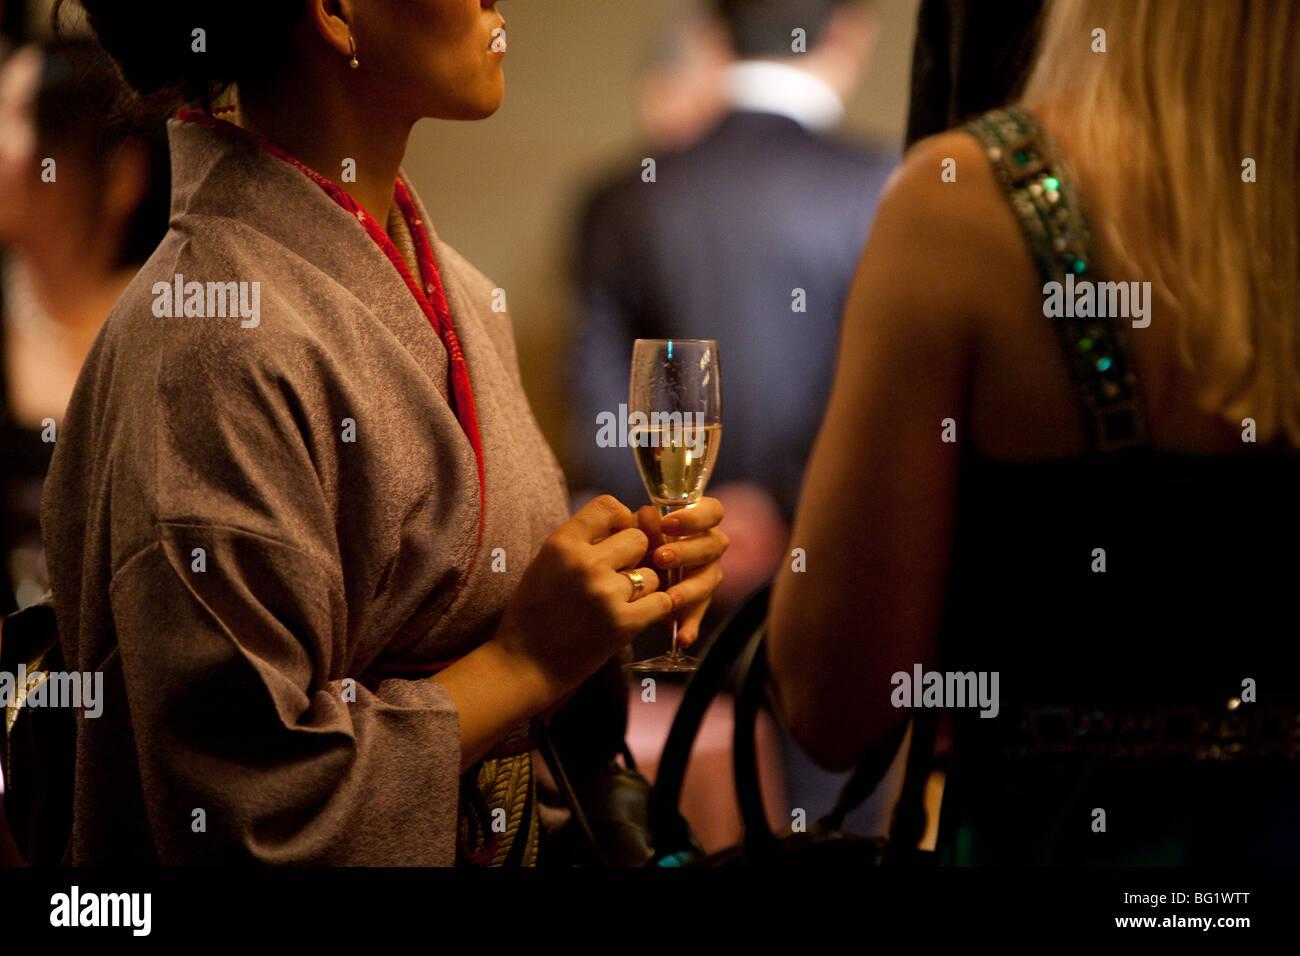 Mujer japonesa en kimono beber champán. Imagen De Stock